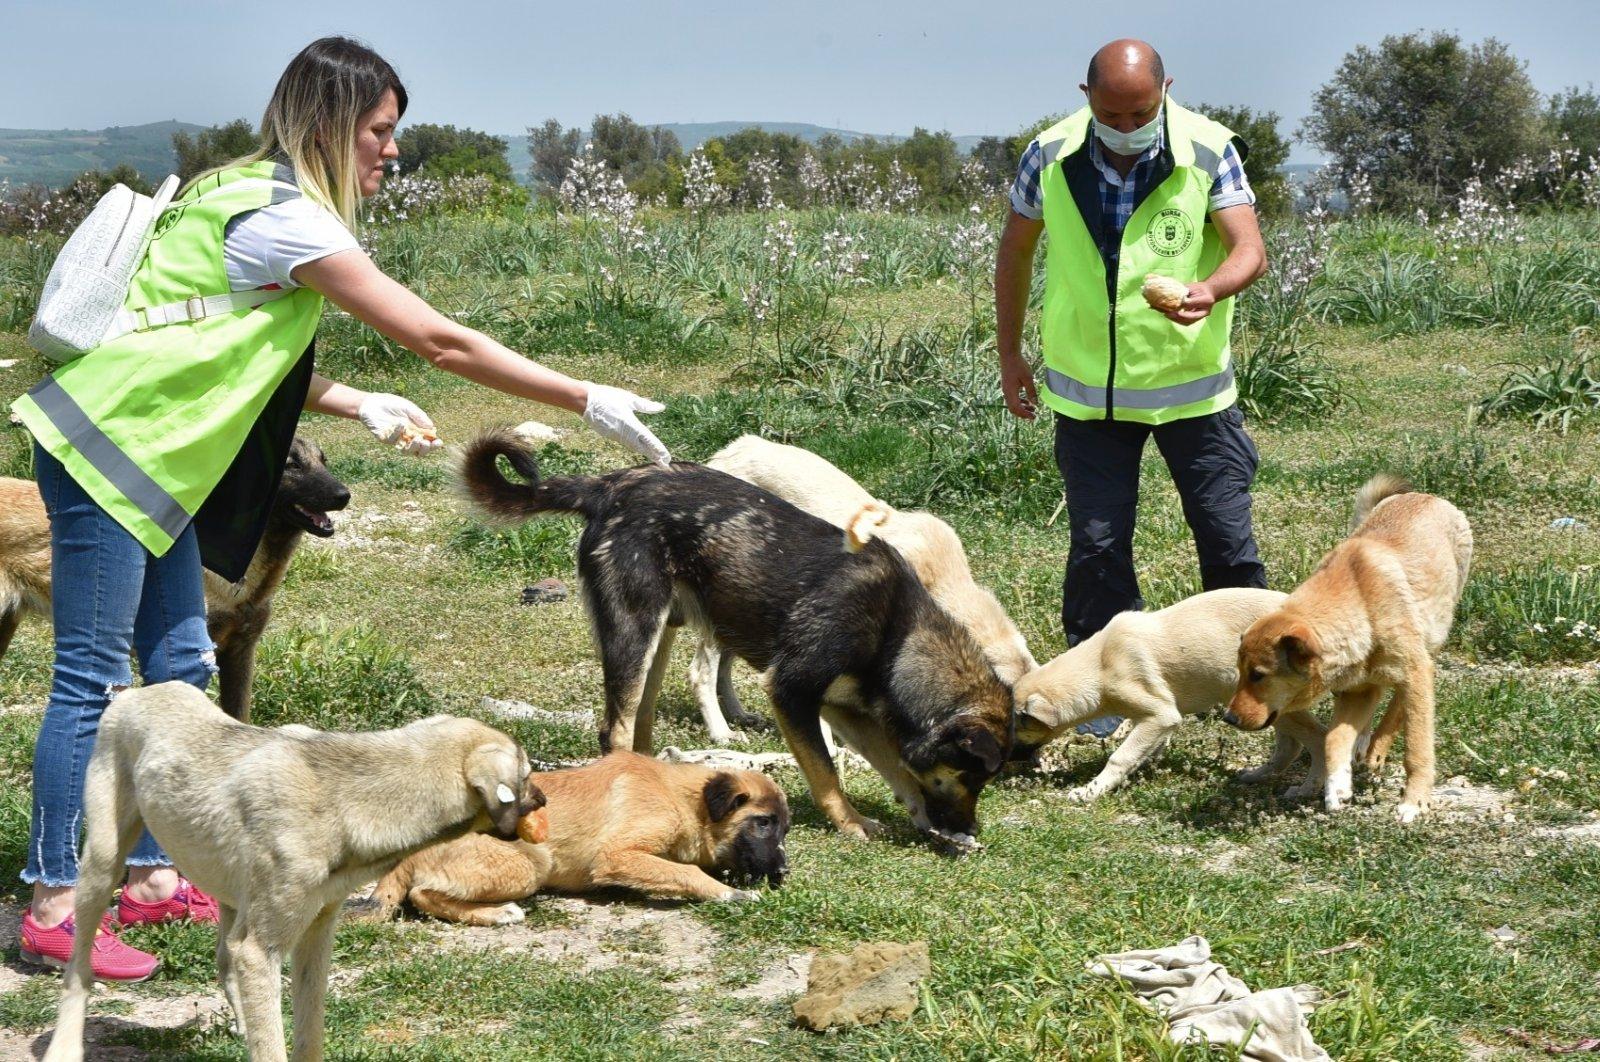 Animal lovers feed stray dogs in the northwestern Bursa province, Turkey, May 1, 2021 (IHA Photo)